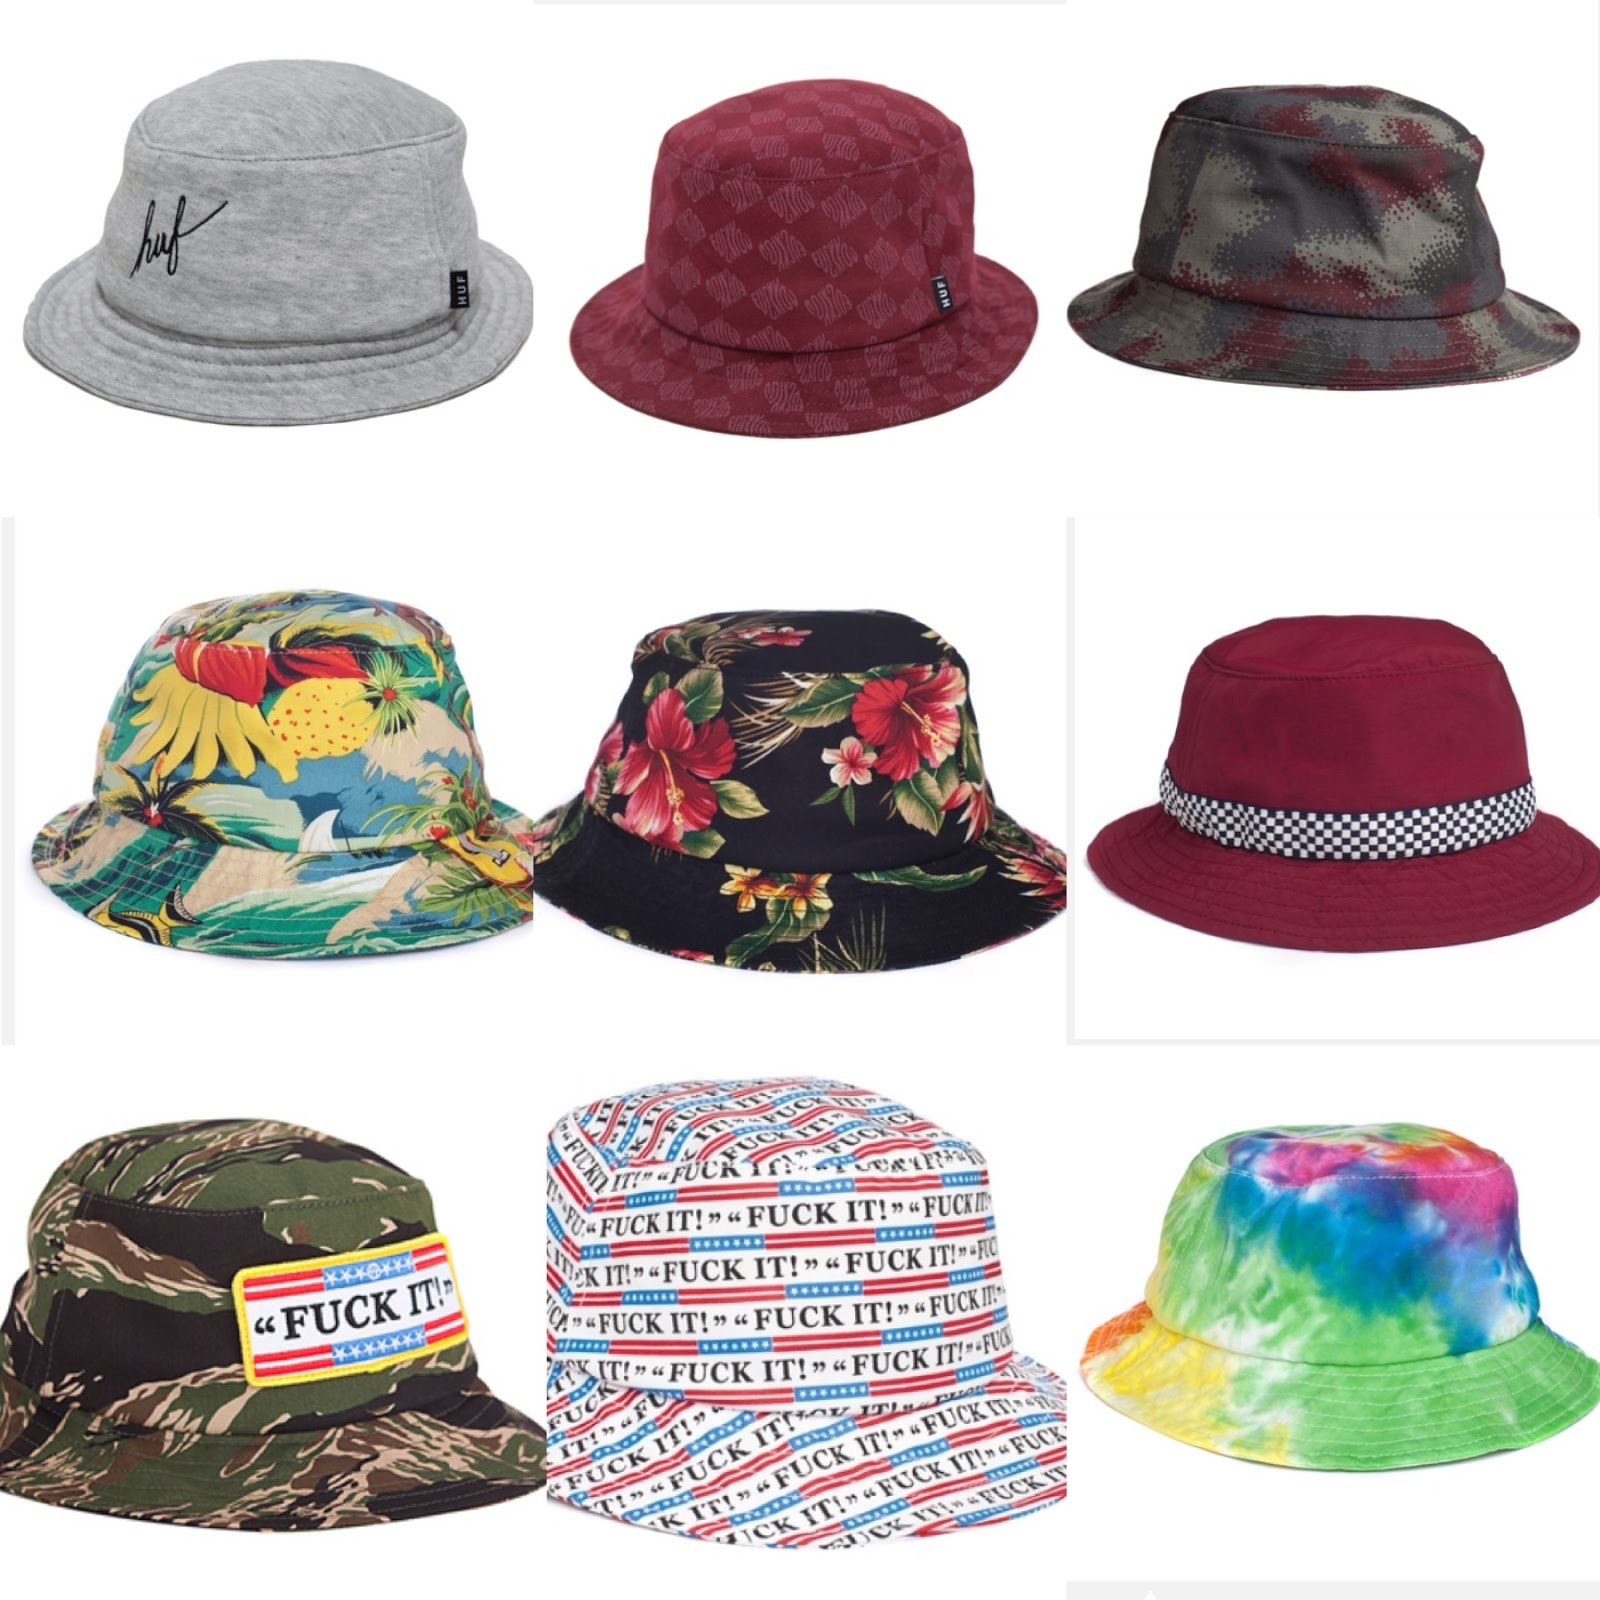 Supreme Bucket hat 2012 seen EARL SWEATSHIRT  eBay